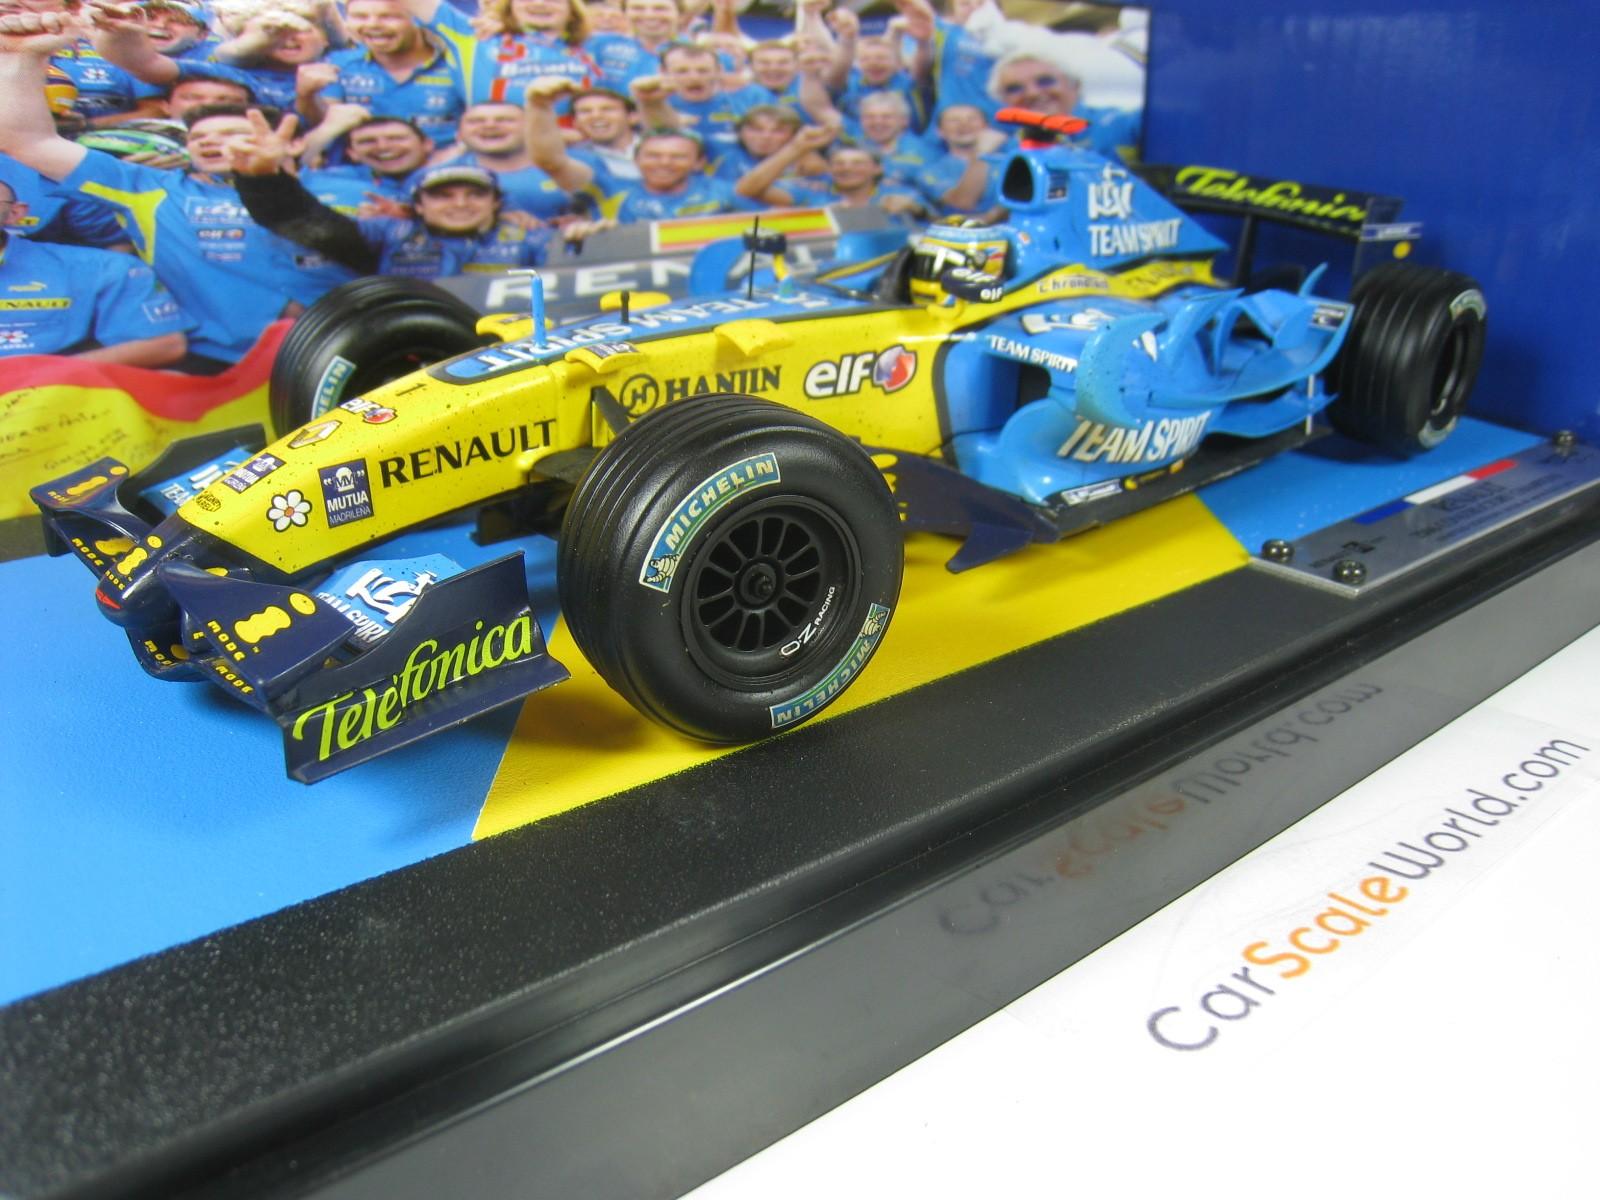 renault-f1-team-alonso-1-18-hotwheels-1.jpeg